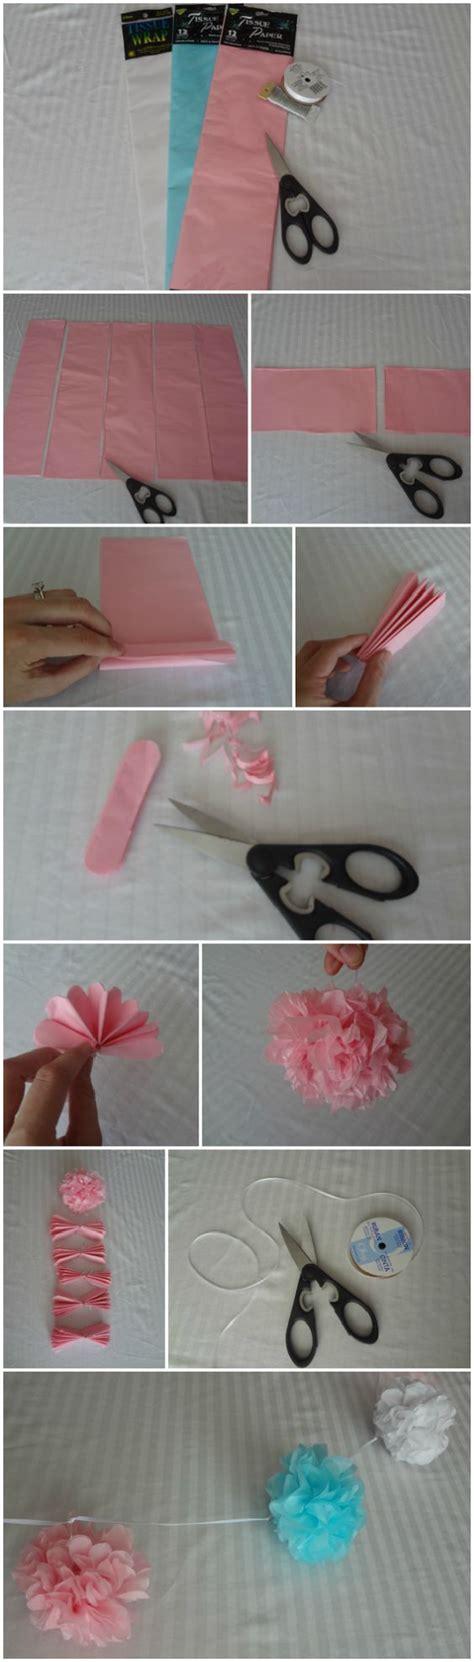 Make Your Own Tissue Paper Pom Poms - how to make a tissue pom pom galand via one stylish